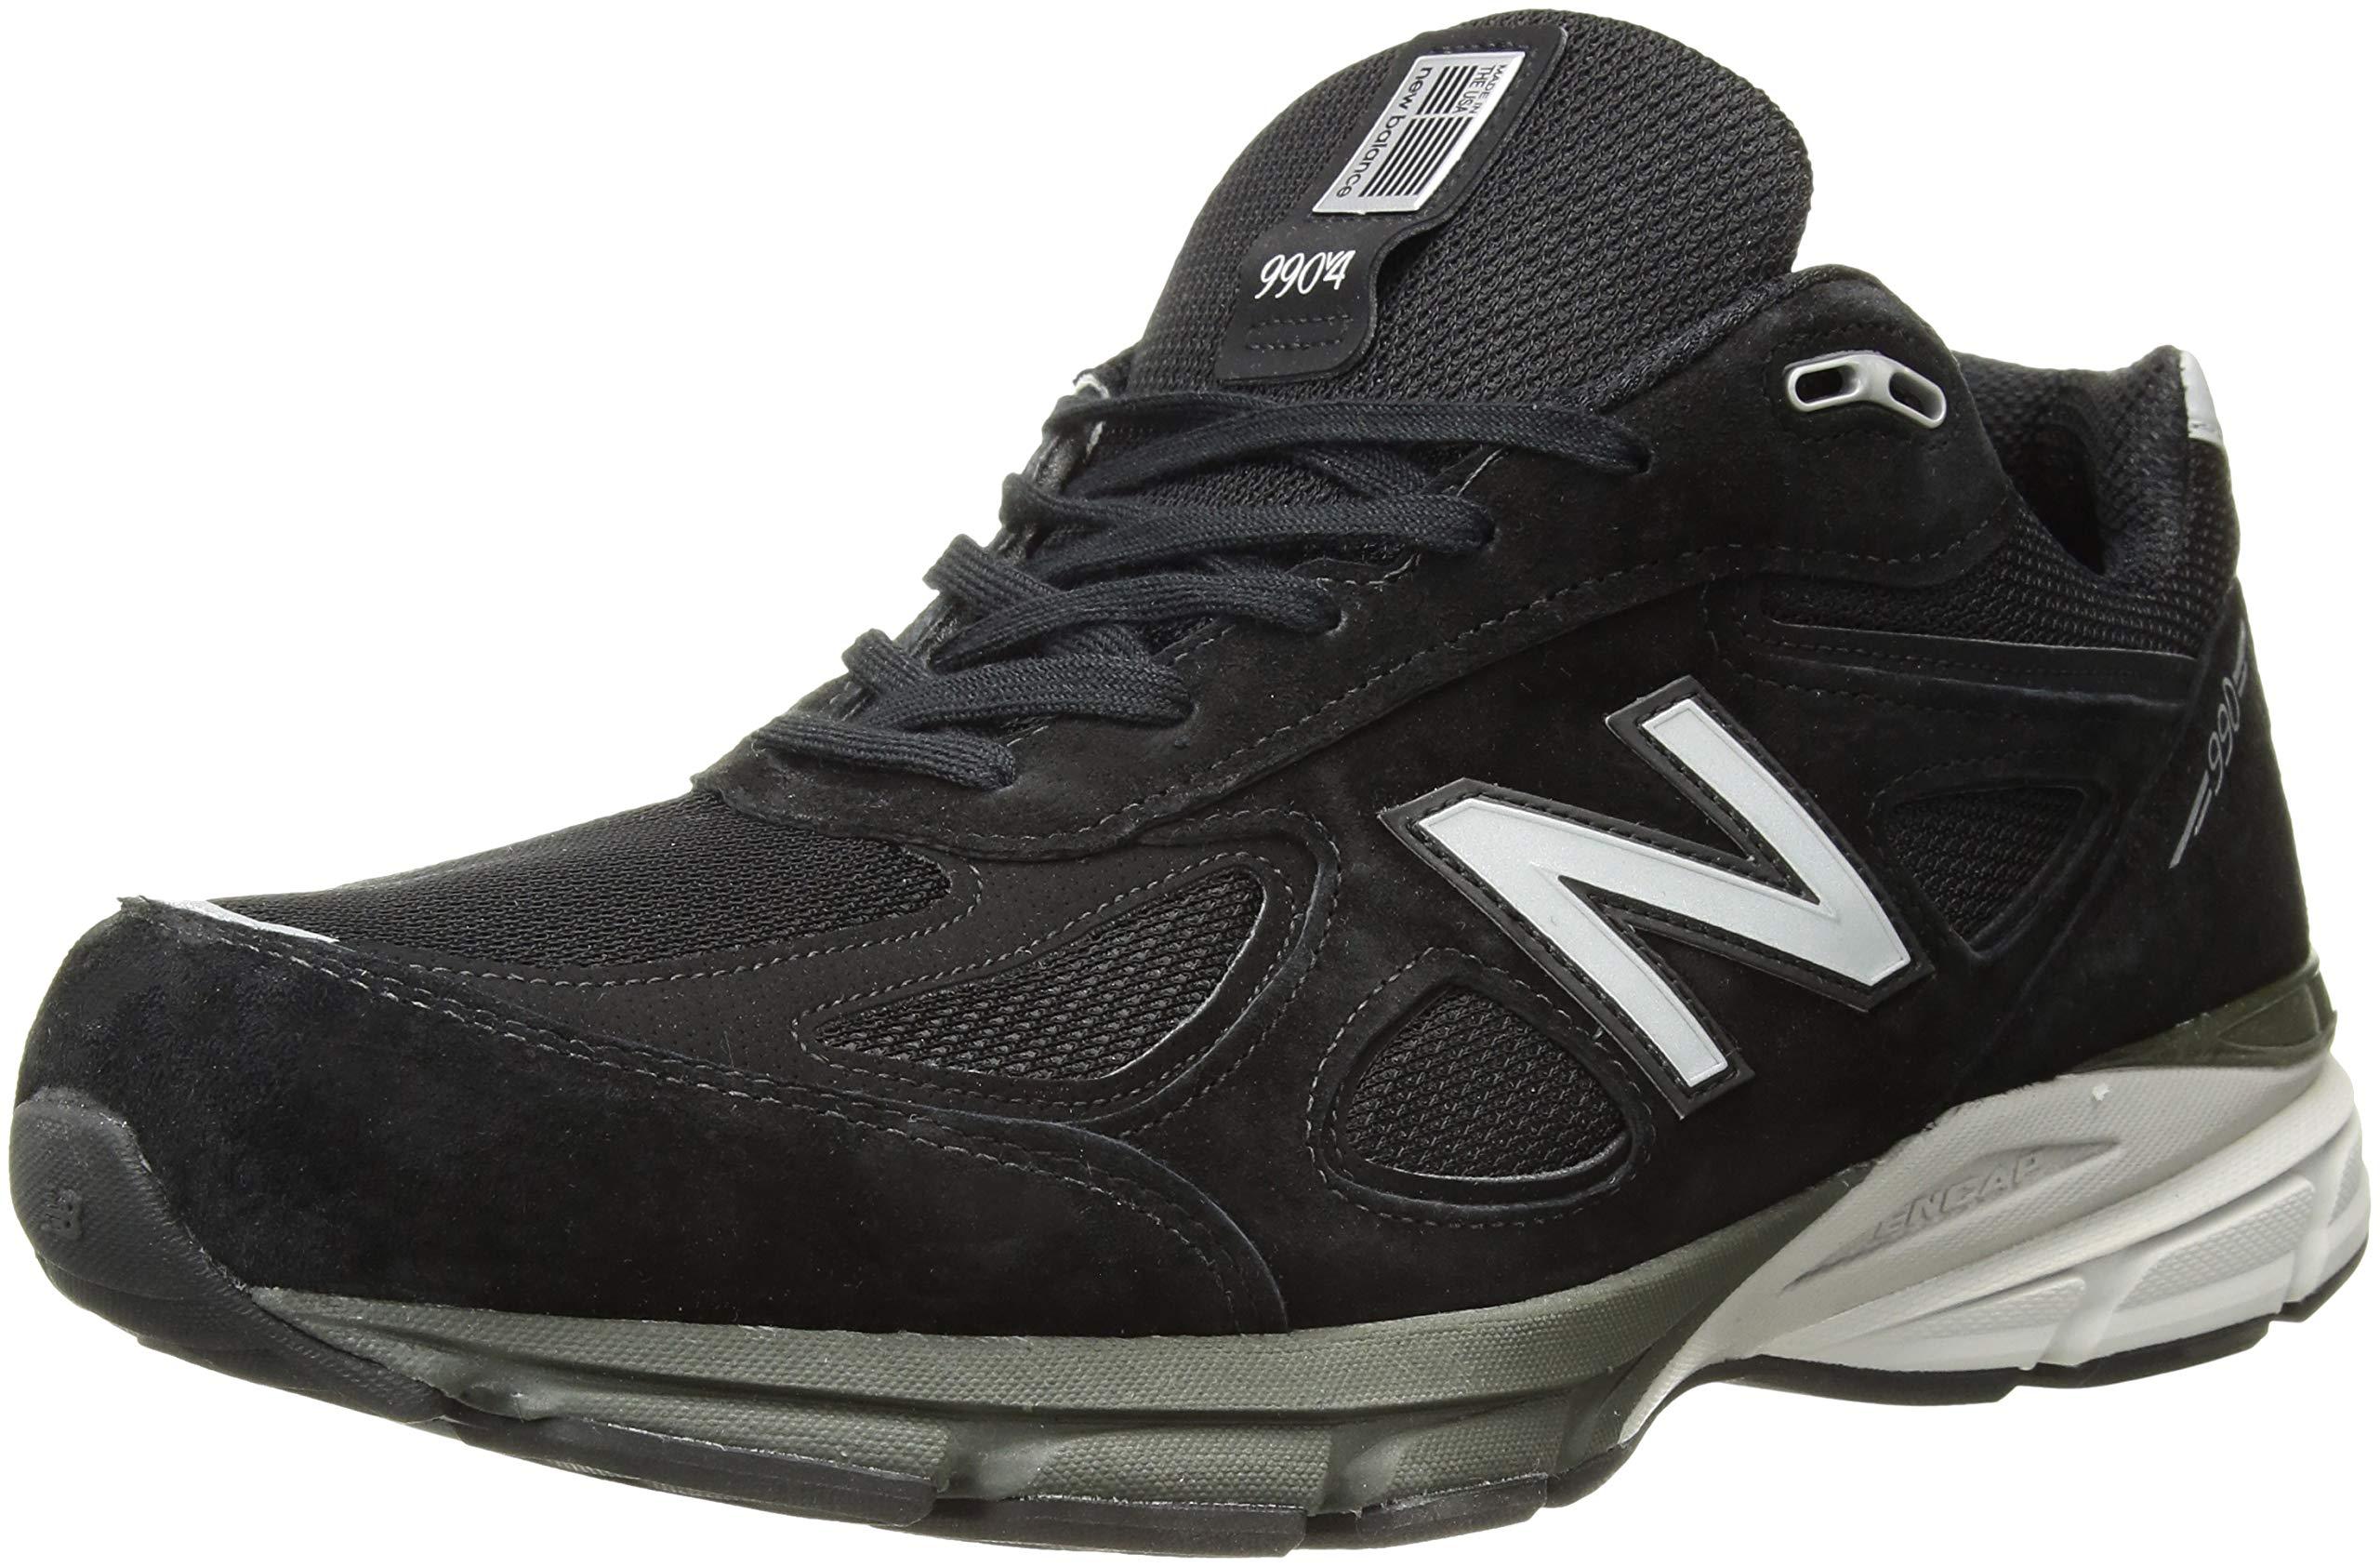 New Balance Men's M990BK4 Running Shoe, Black/Silver, 7 D US by New Balance (Image #1)